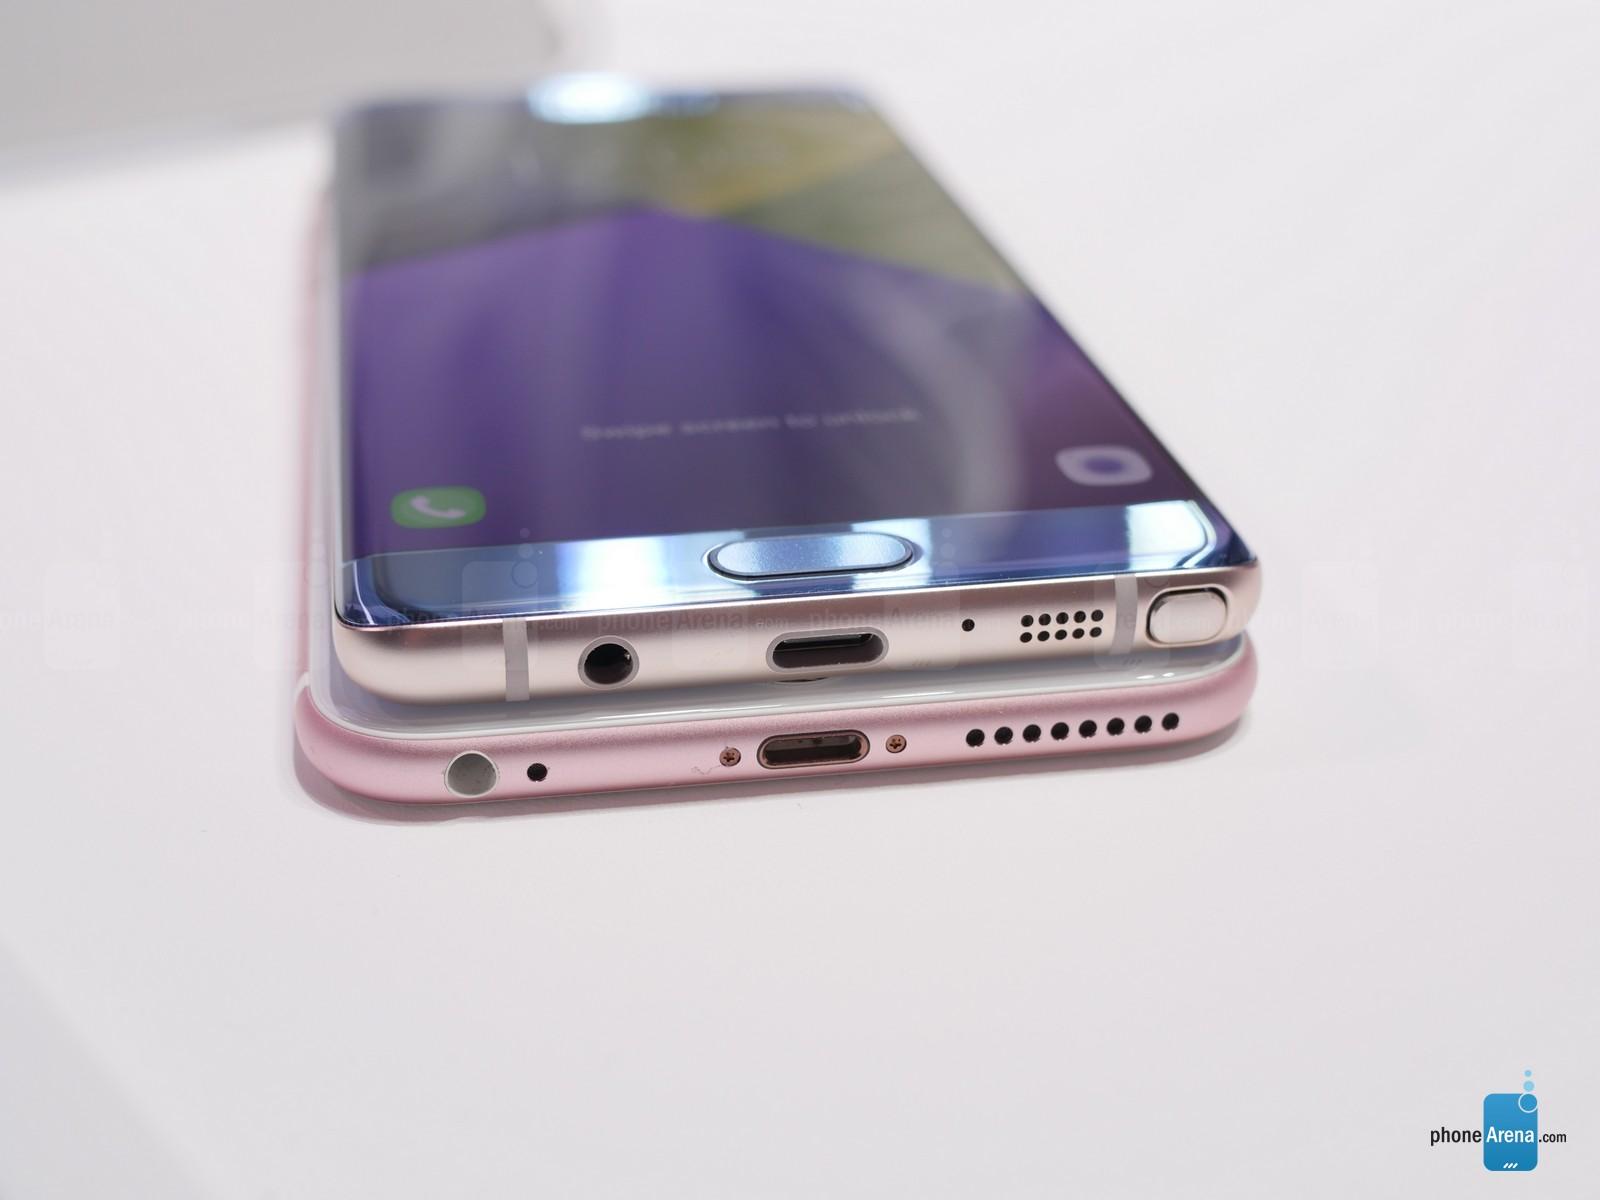 Samsung-Galaxy-Note-7-vs-Applegfg-iPhone-6s-Plus